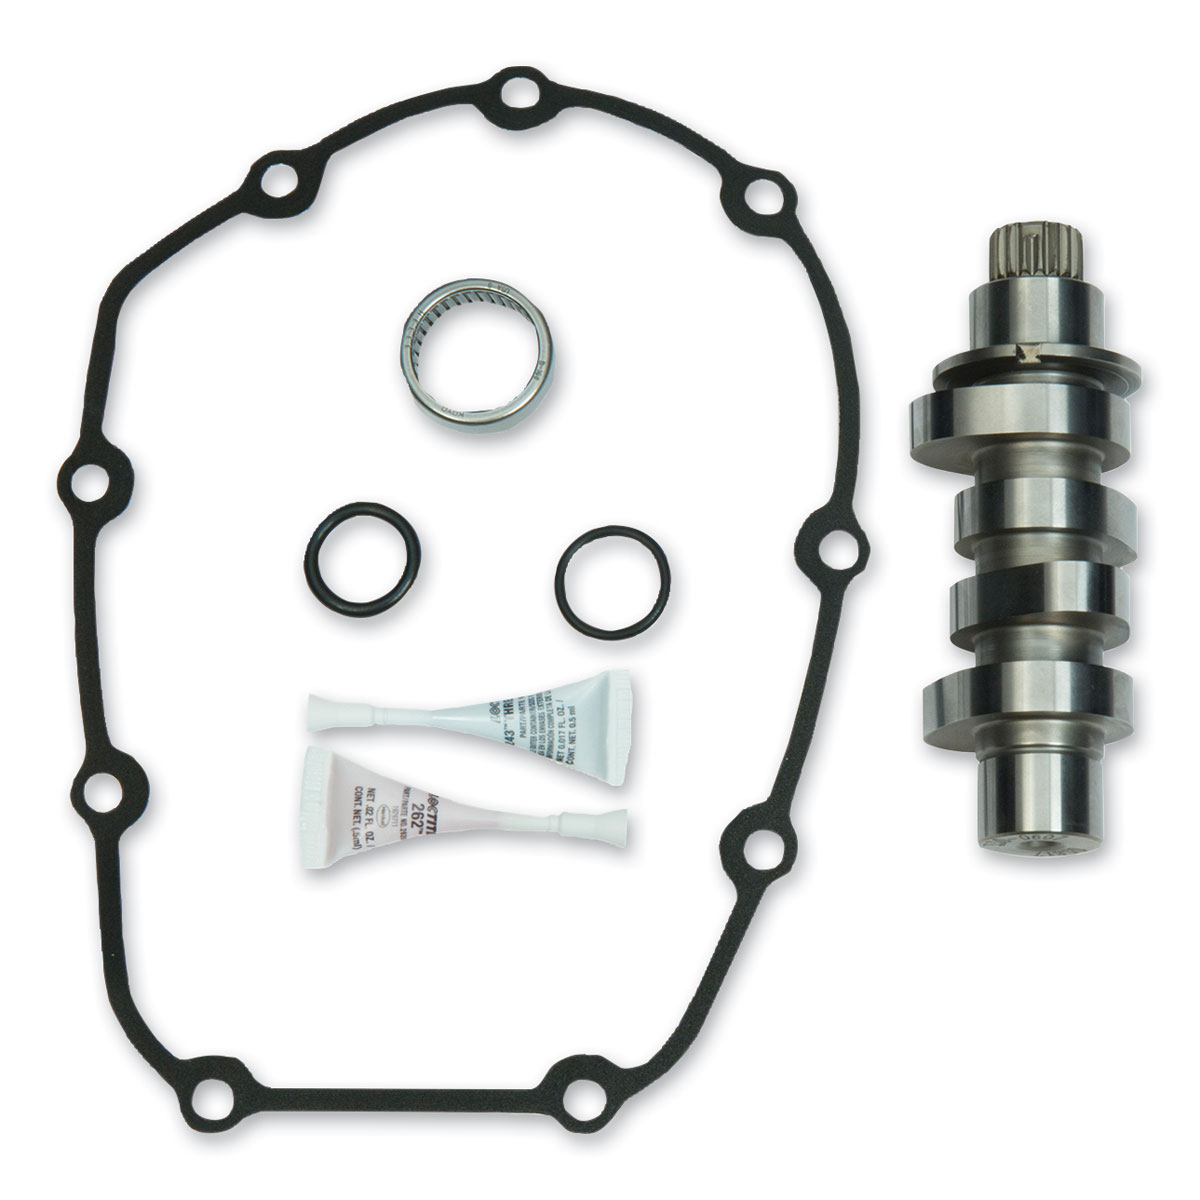 S Amp S Cycle Chain Drive Camshaft Kit 475c